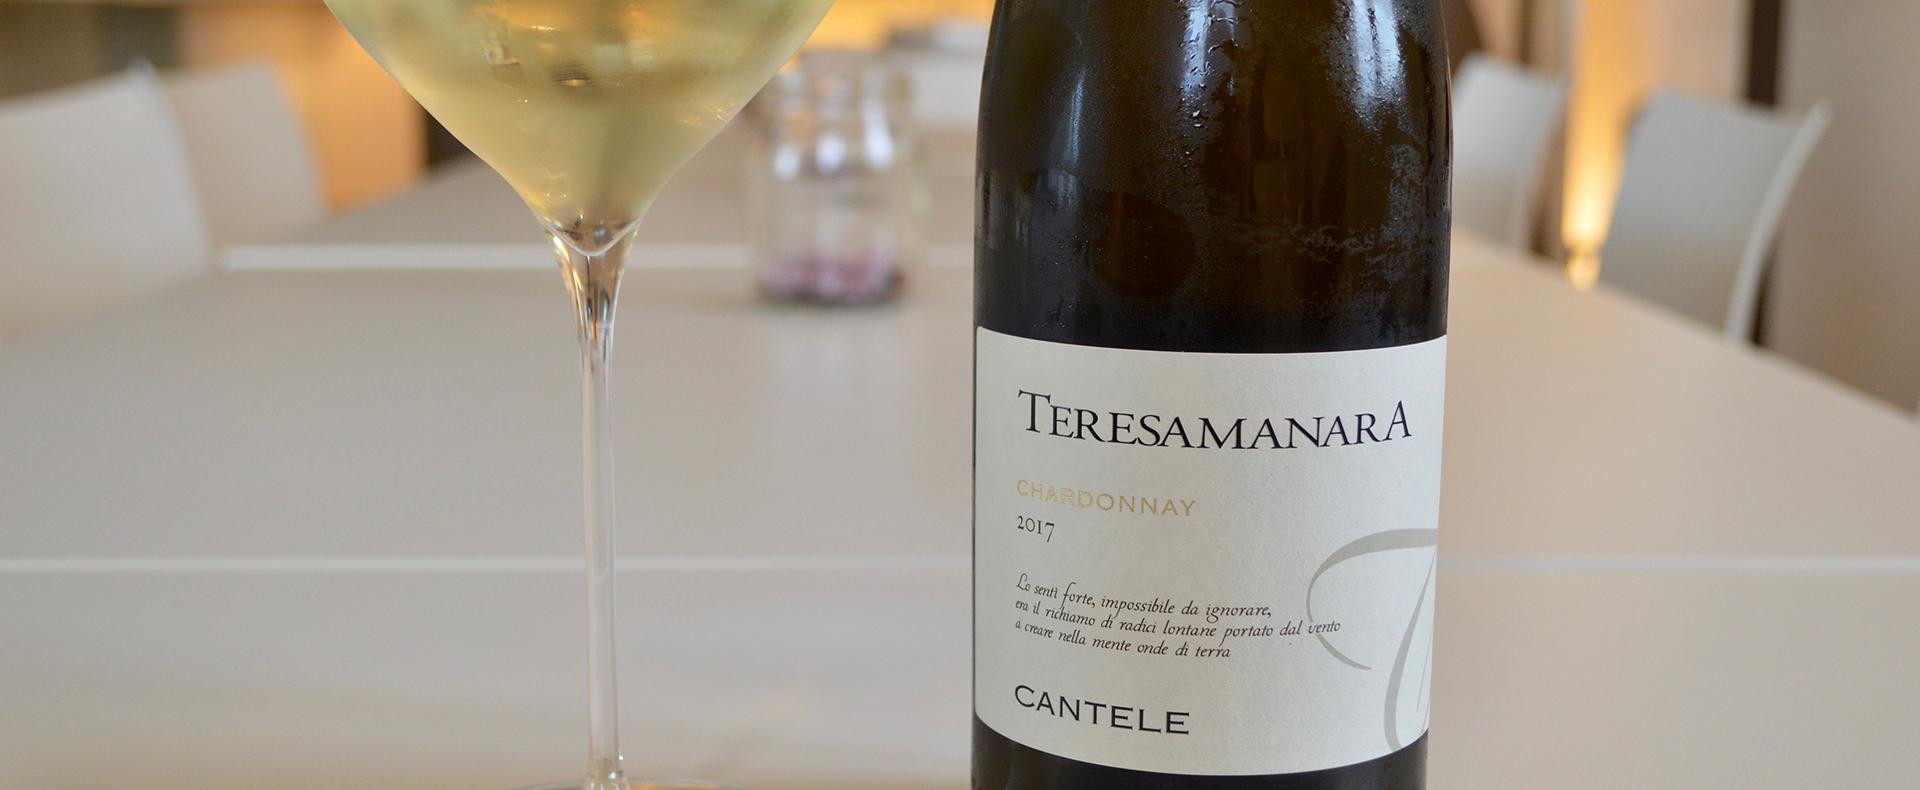 "Coming soon to America: Teresa Manara Chardonnay 2017, a ""spectacular vintage"""